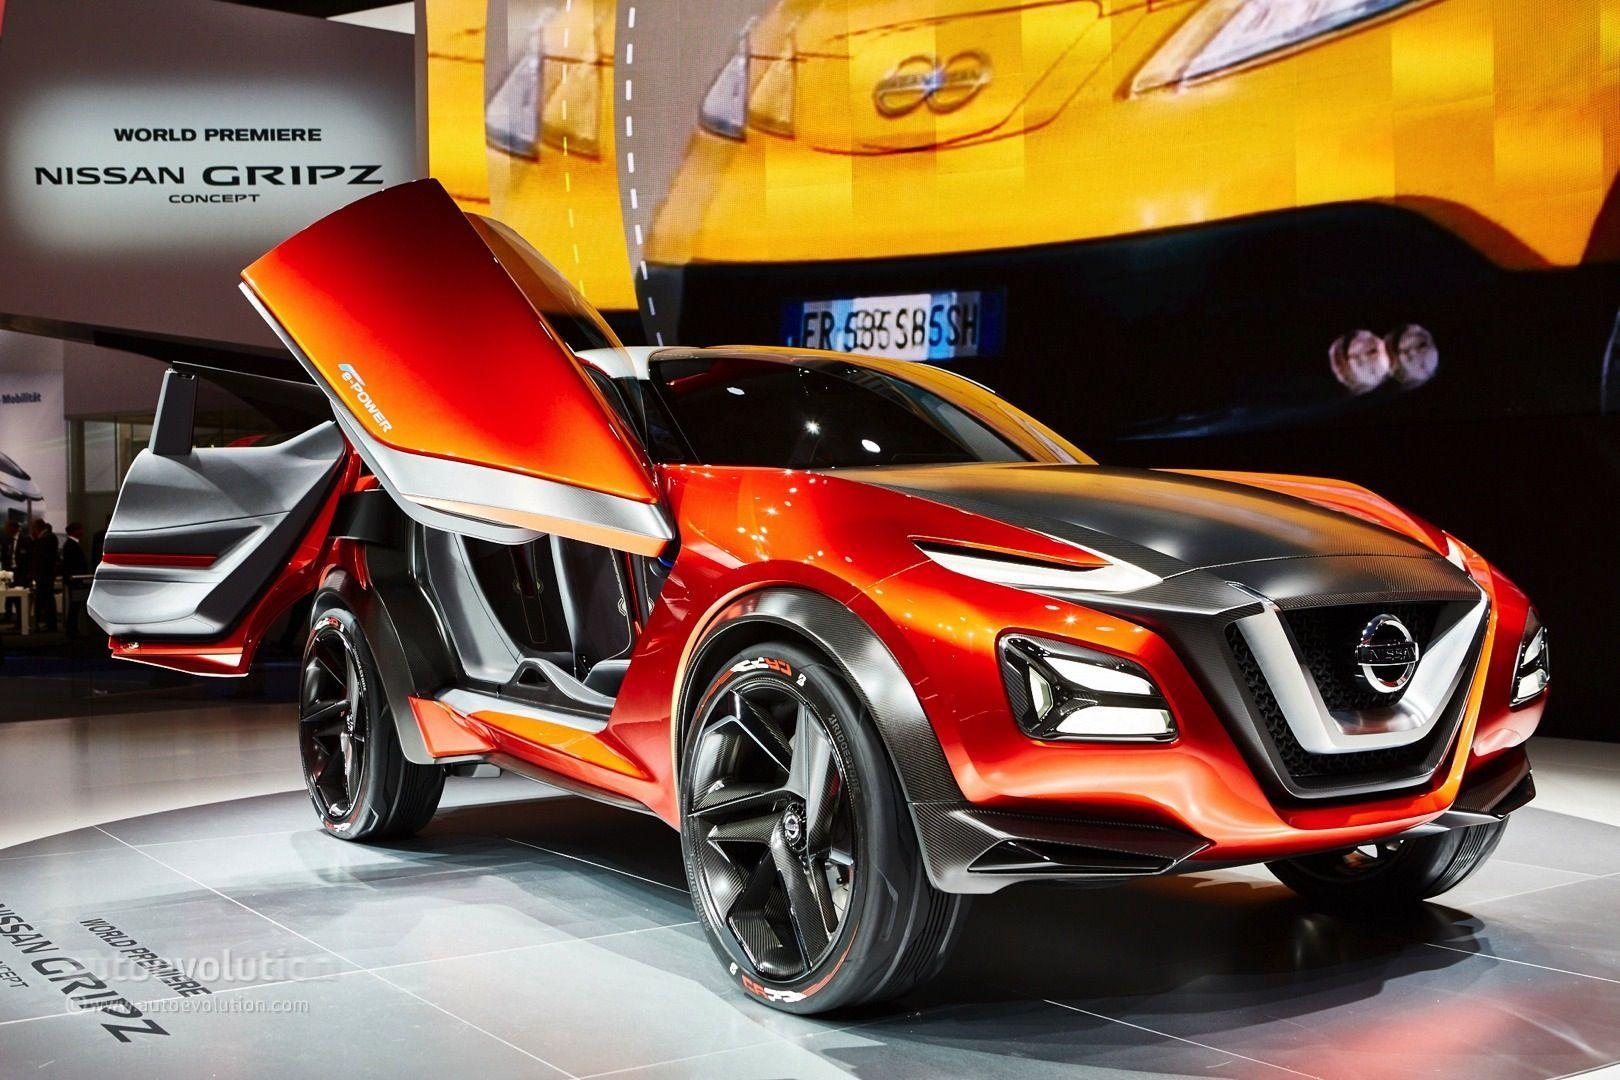 2020 Nissan Juke Nismo New Concept Nissan juke, Nissan